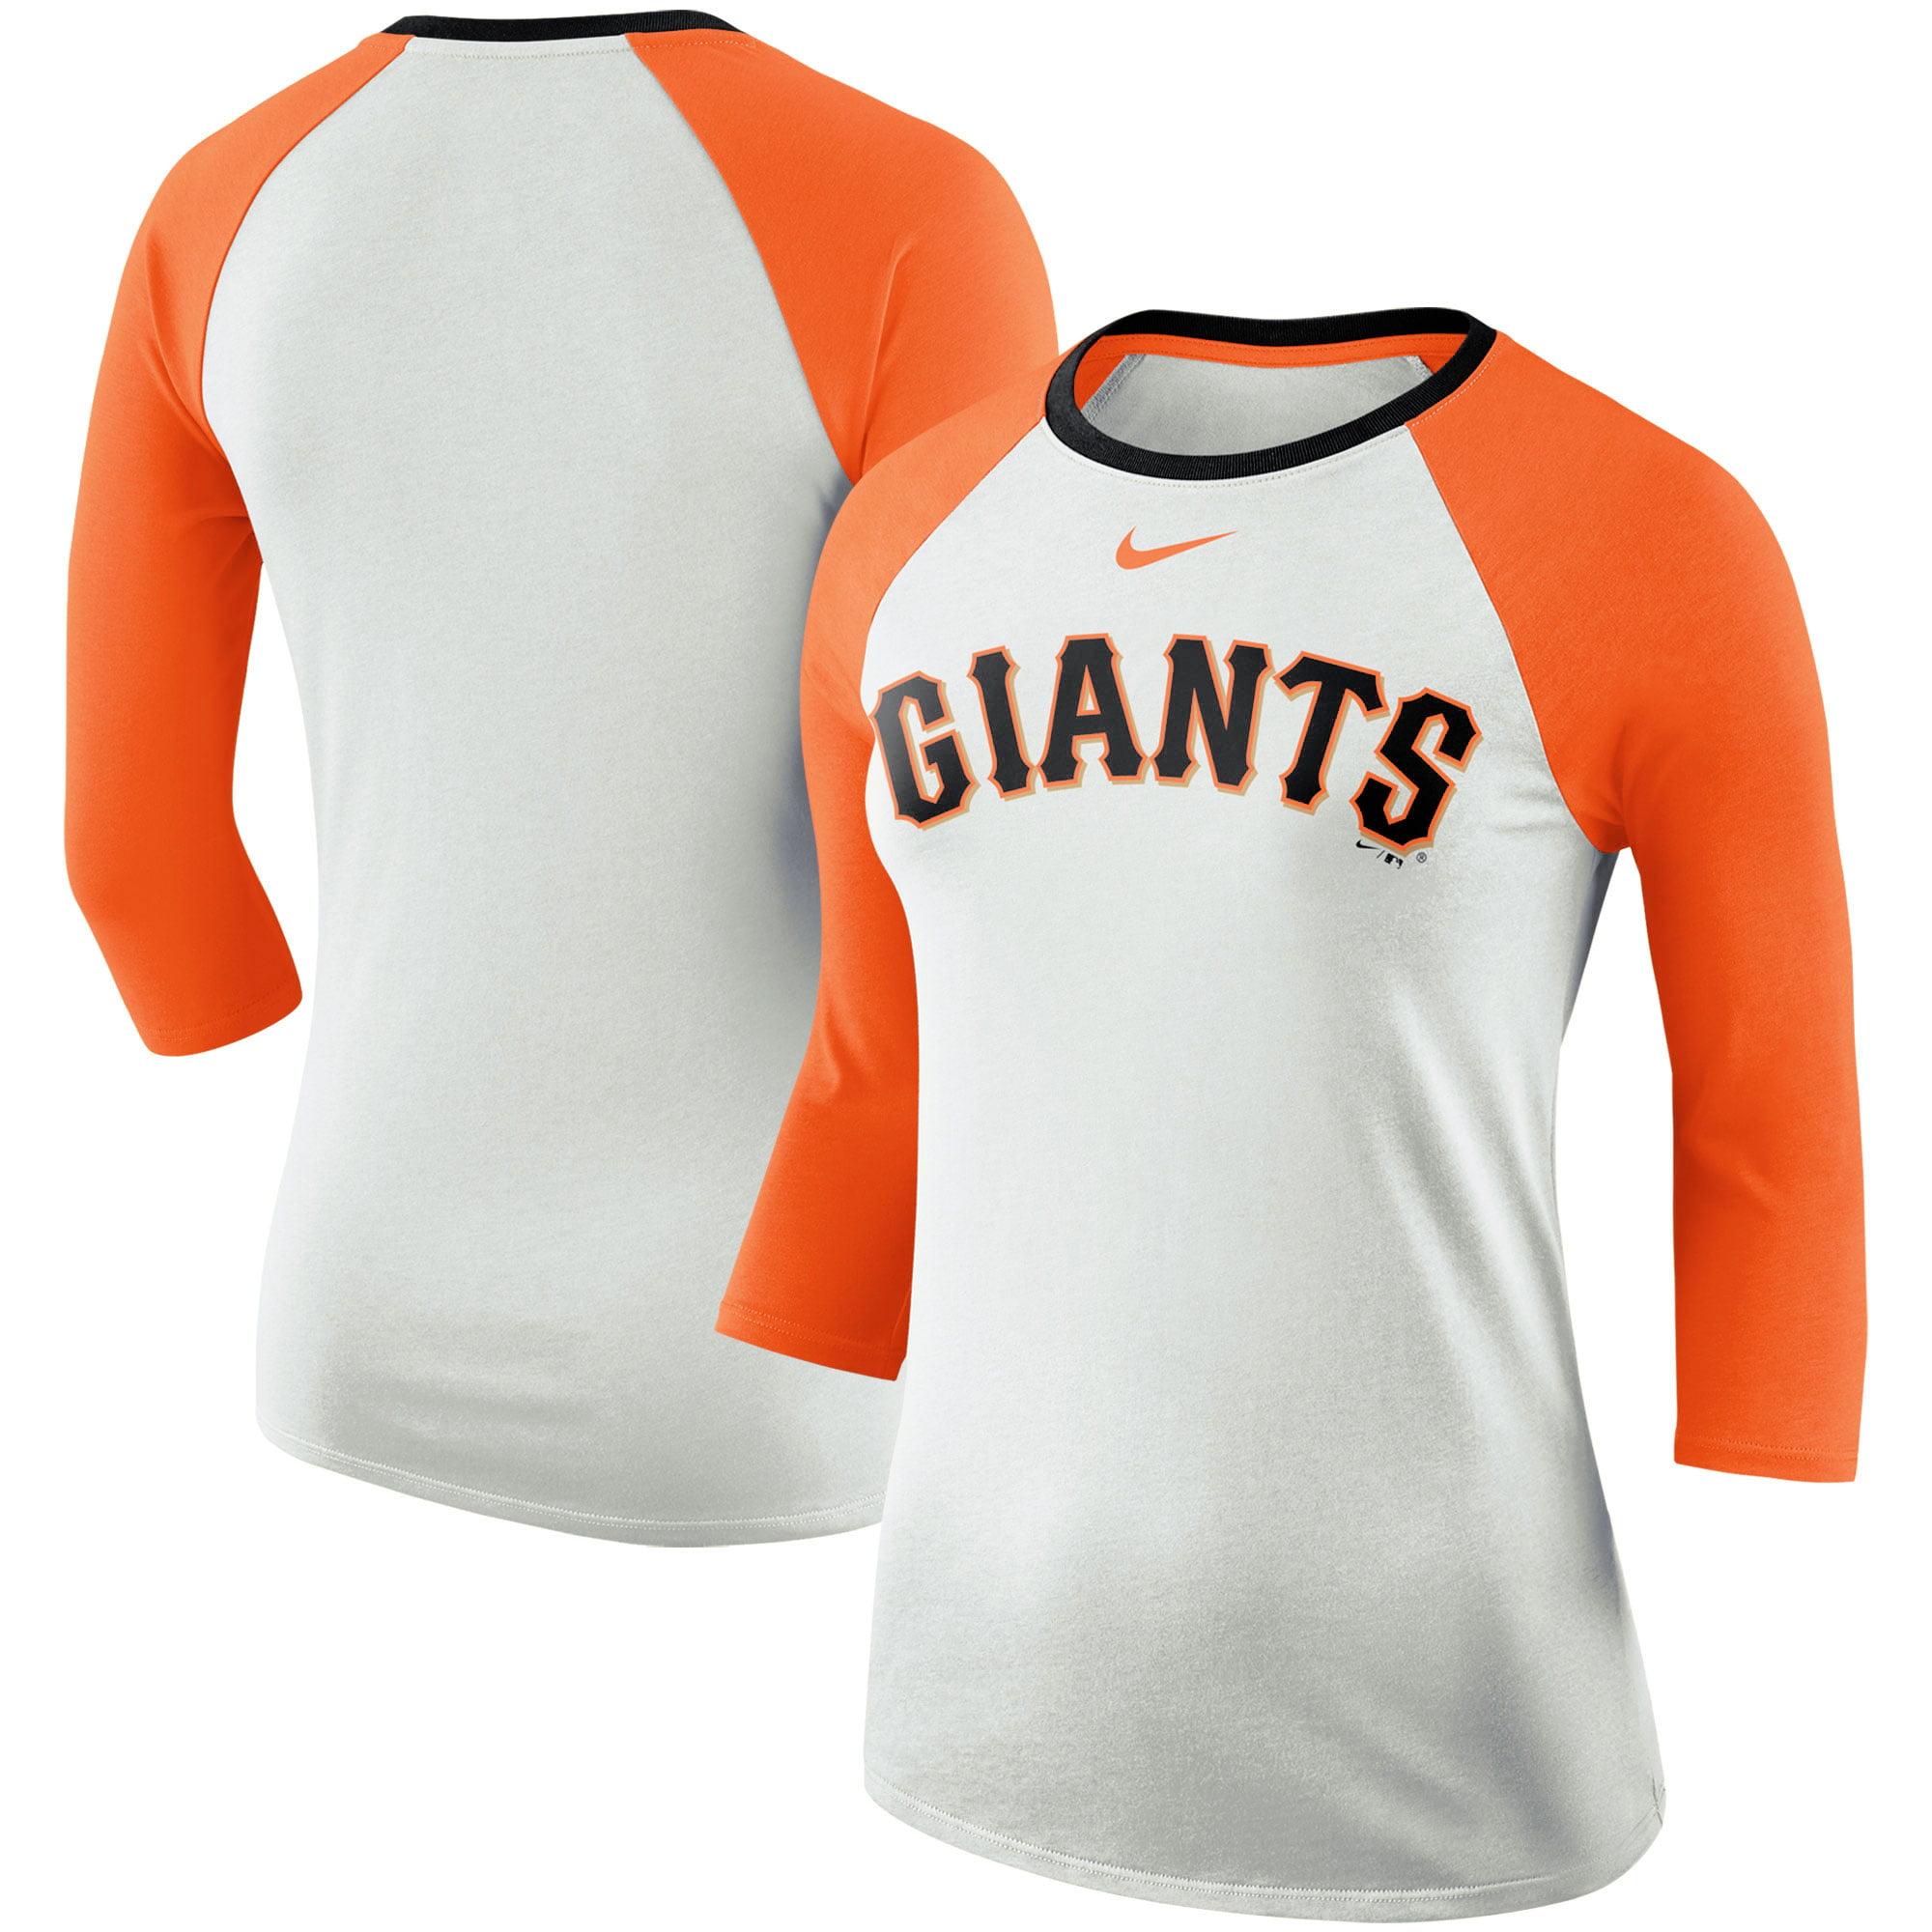 San Francisco Giants Nike Women's Tri-Blend Raglan 3/4-Sleeve T-Shirt - White/Orange